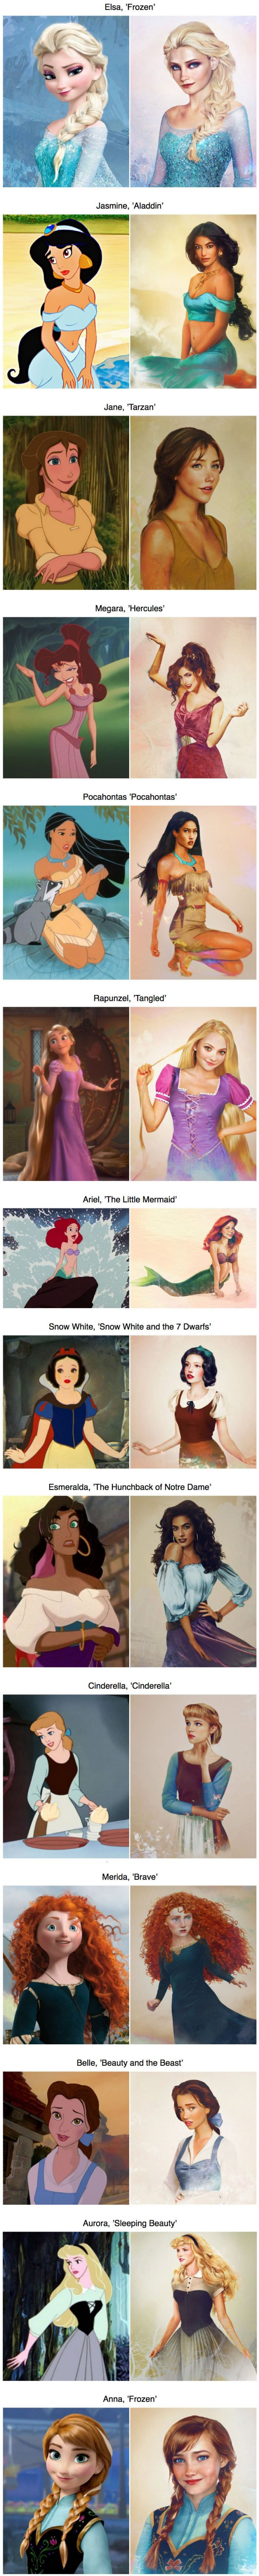 What the real Disney princesses looked like (By Jirka Väätäinen) Jane, Esmeralda, Anna, Belle look so pretty?!!??